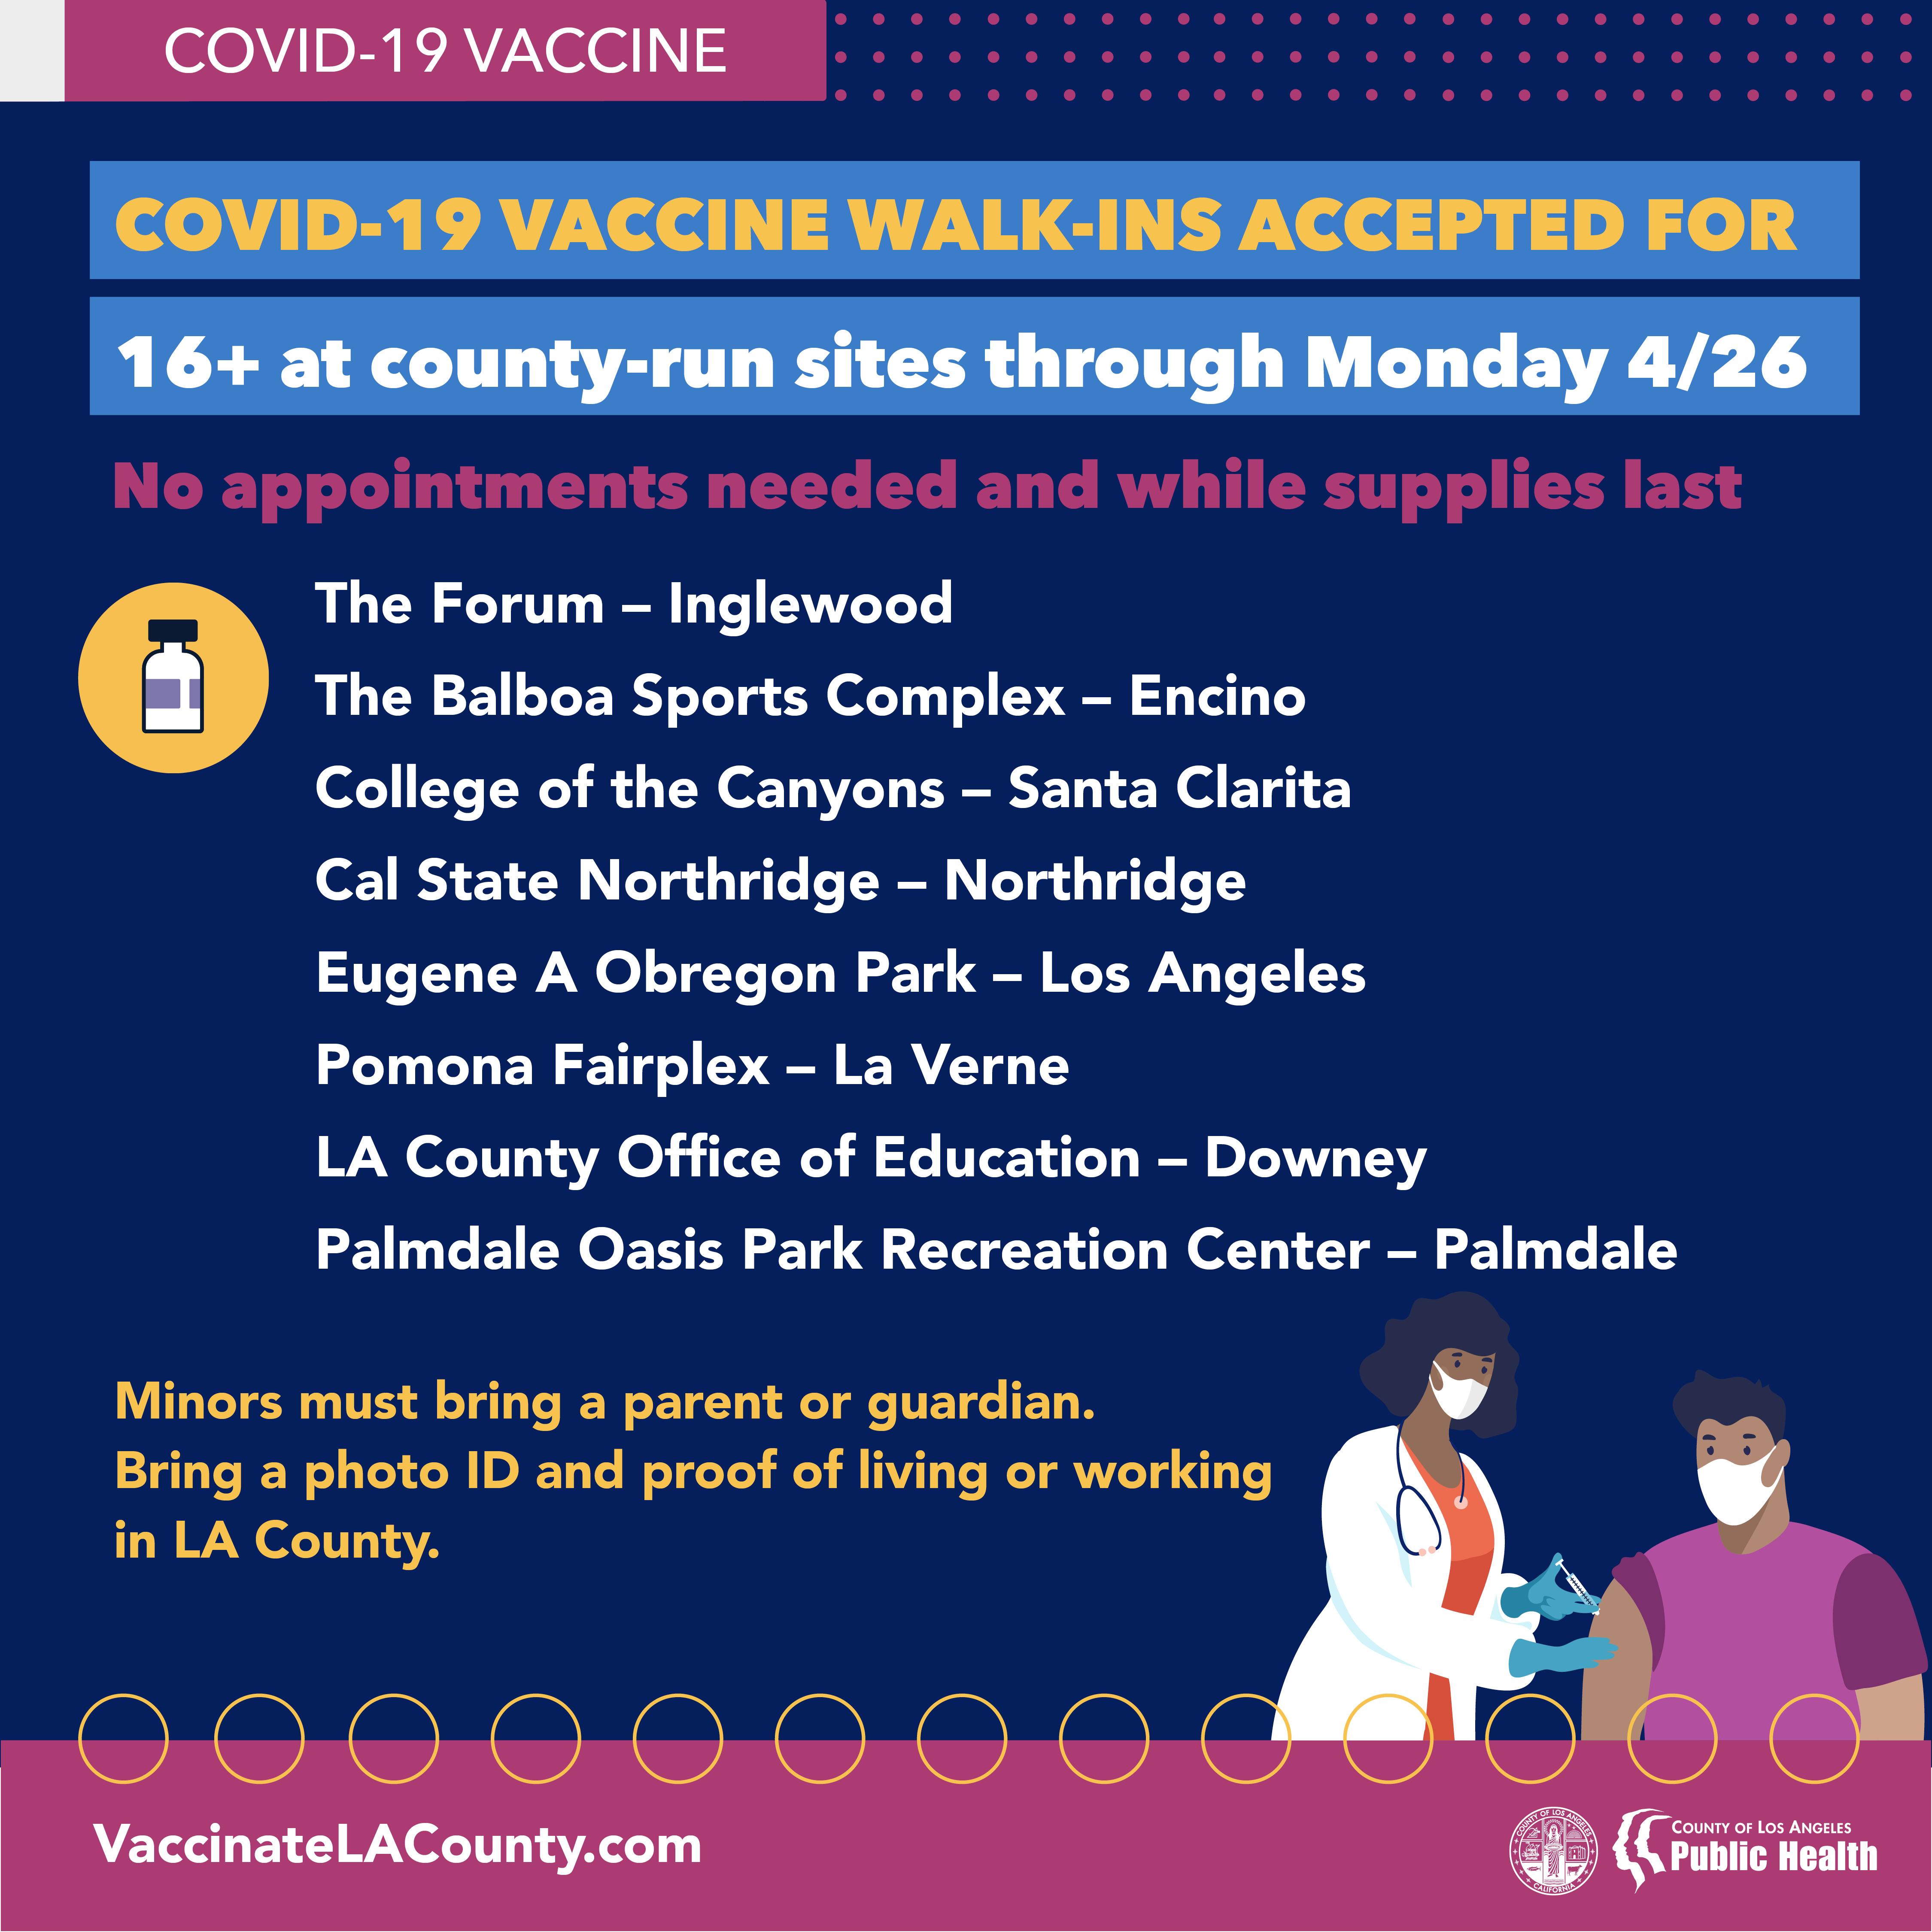 Vaccine_graphic_6